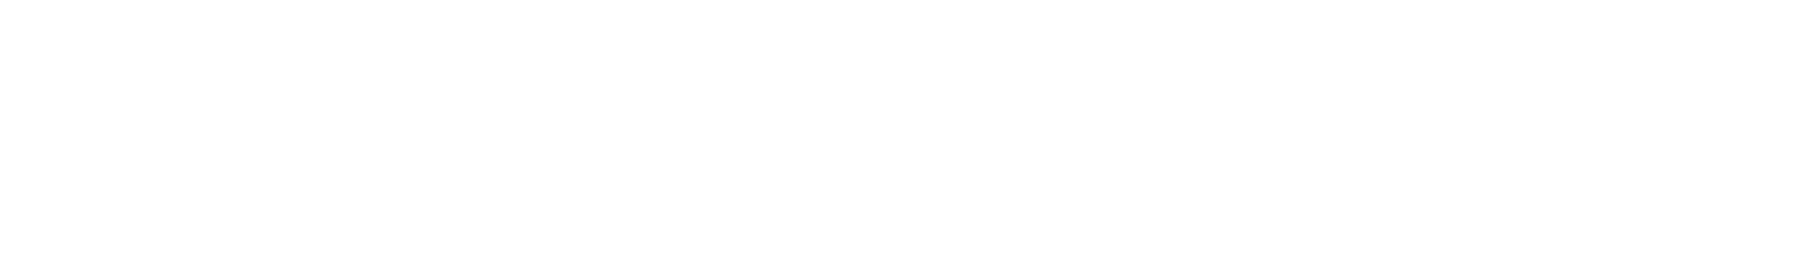 vox 021